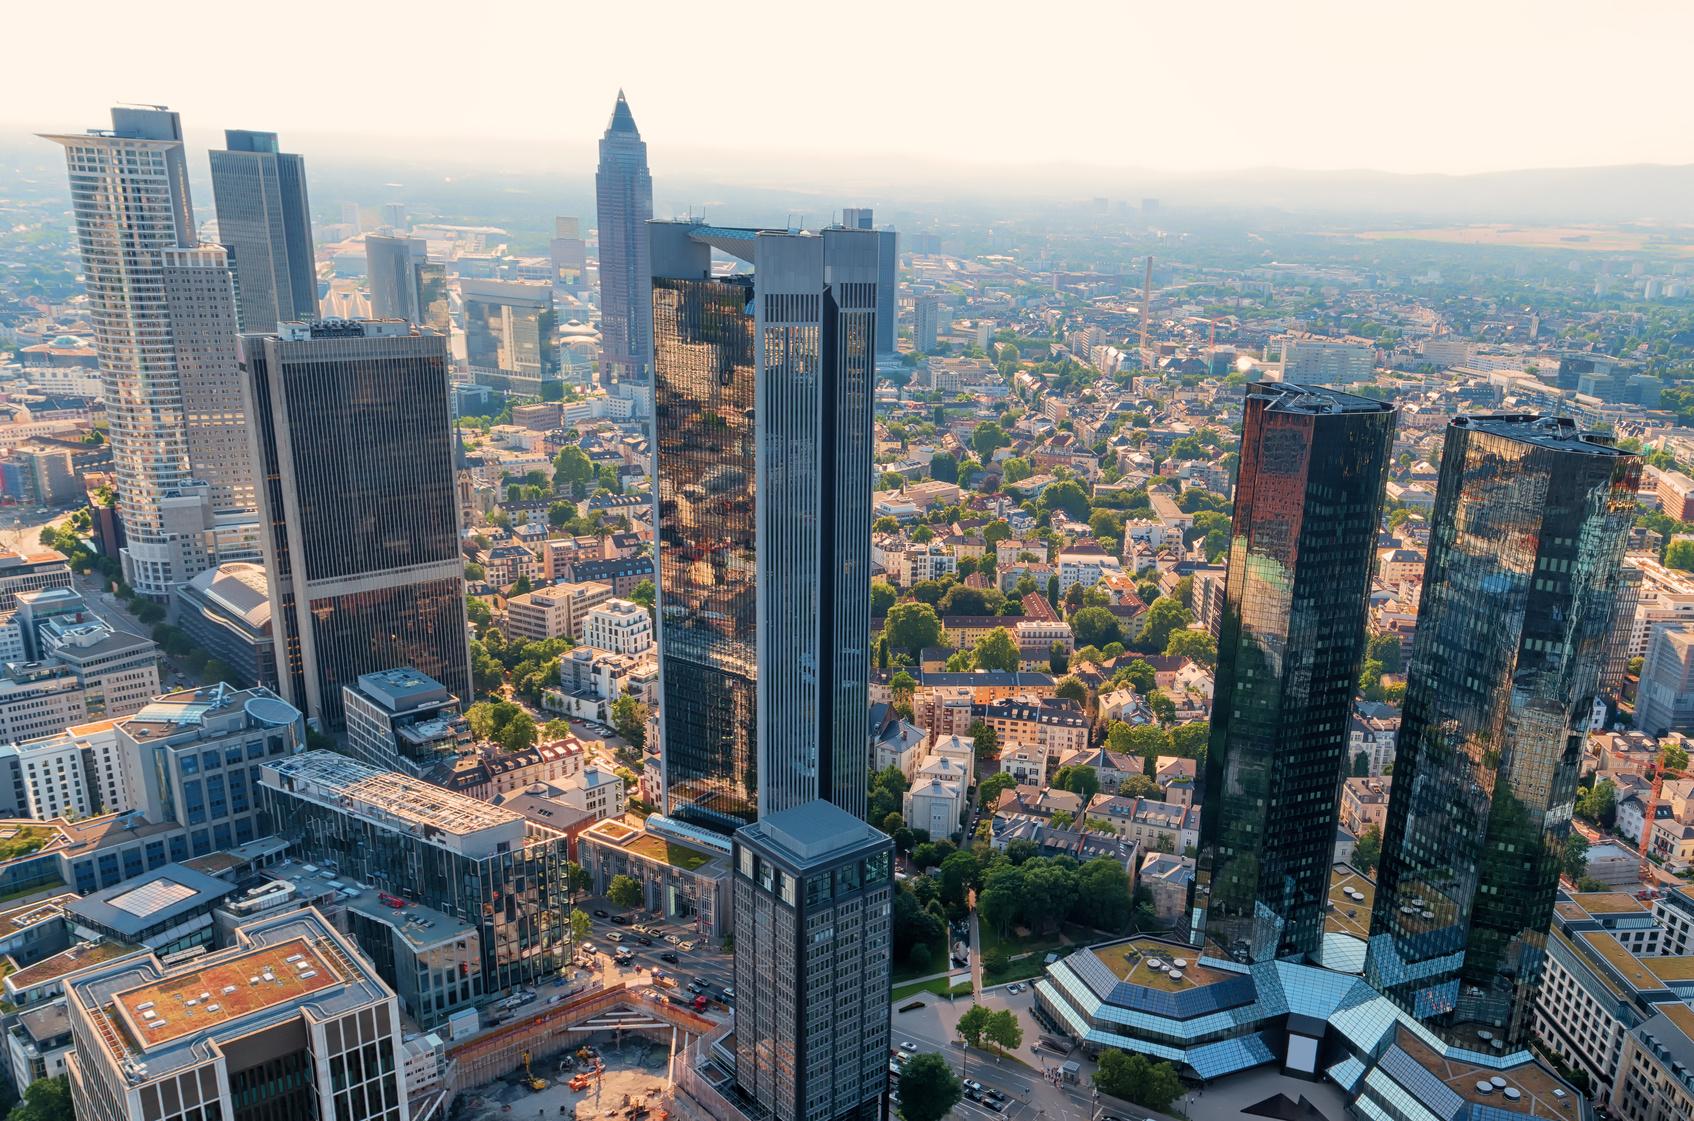 Frankfurt Banking District